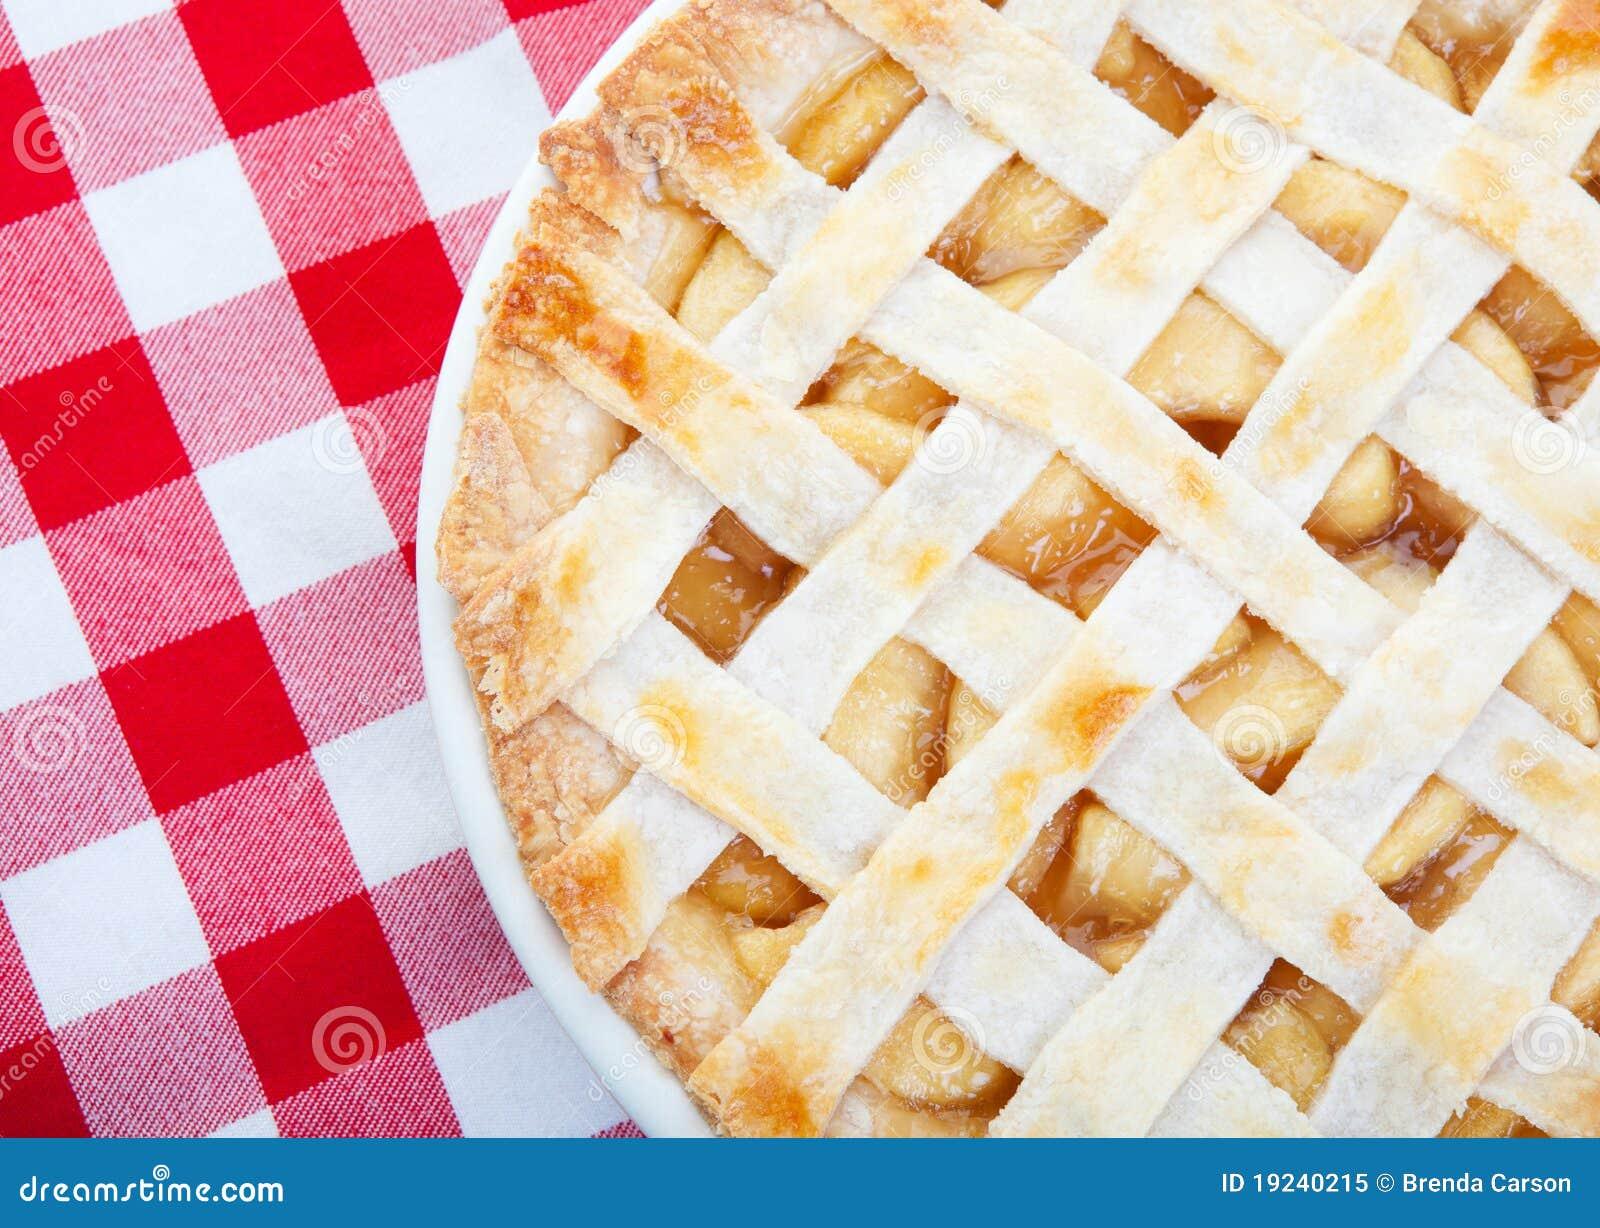 Apple Pie Royalty Free Stock Photo Image 19240215